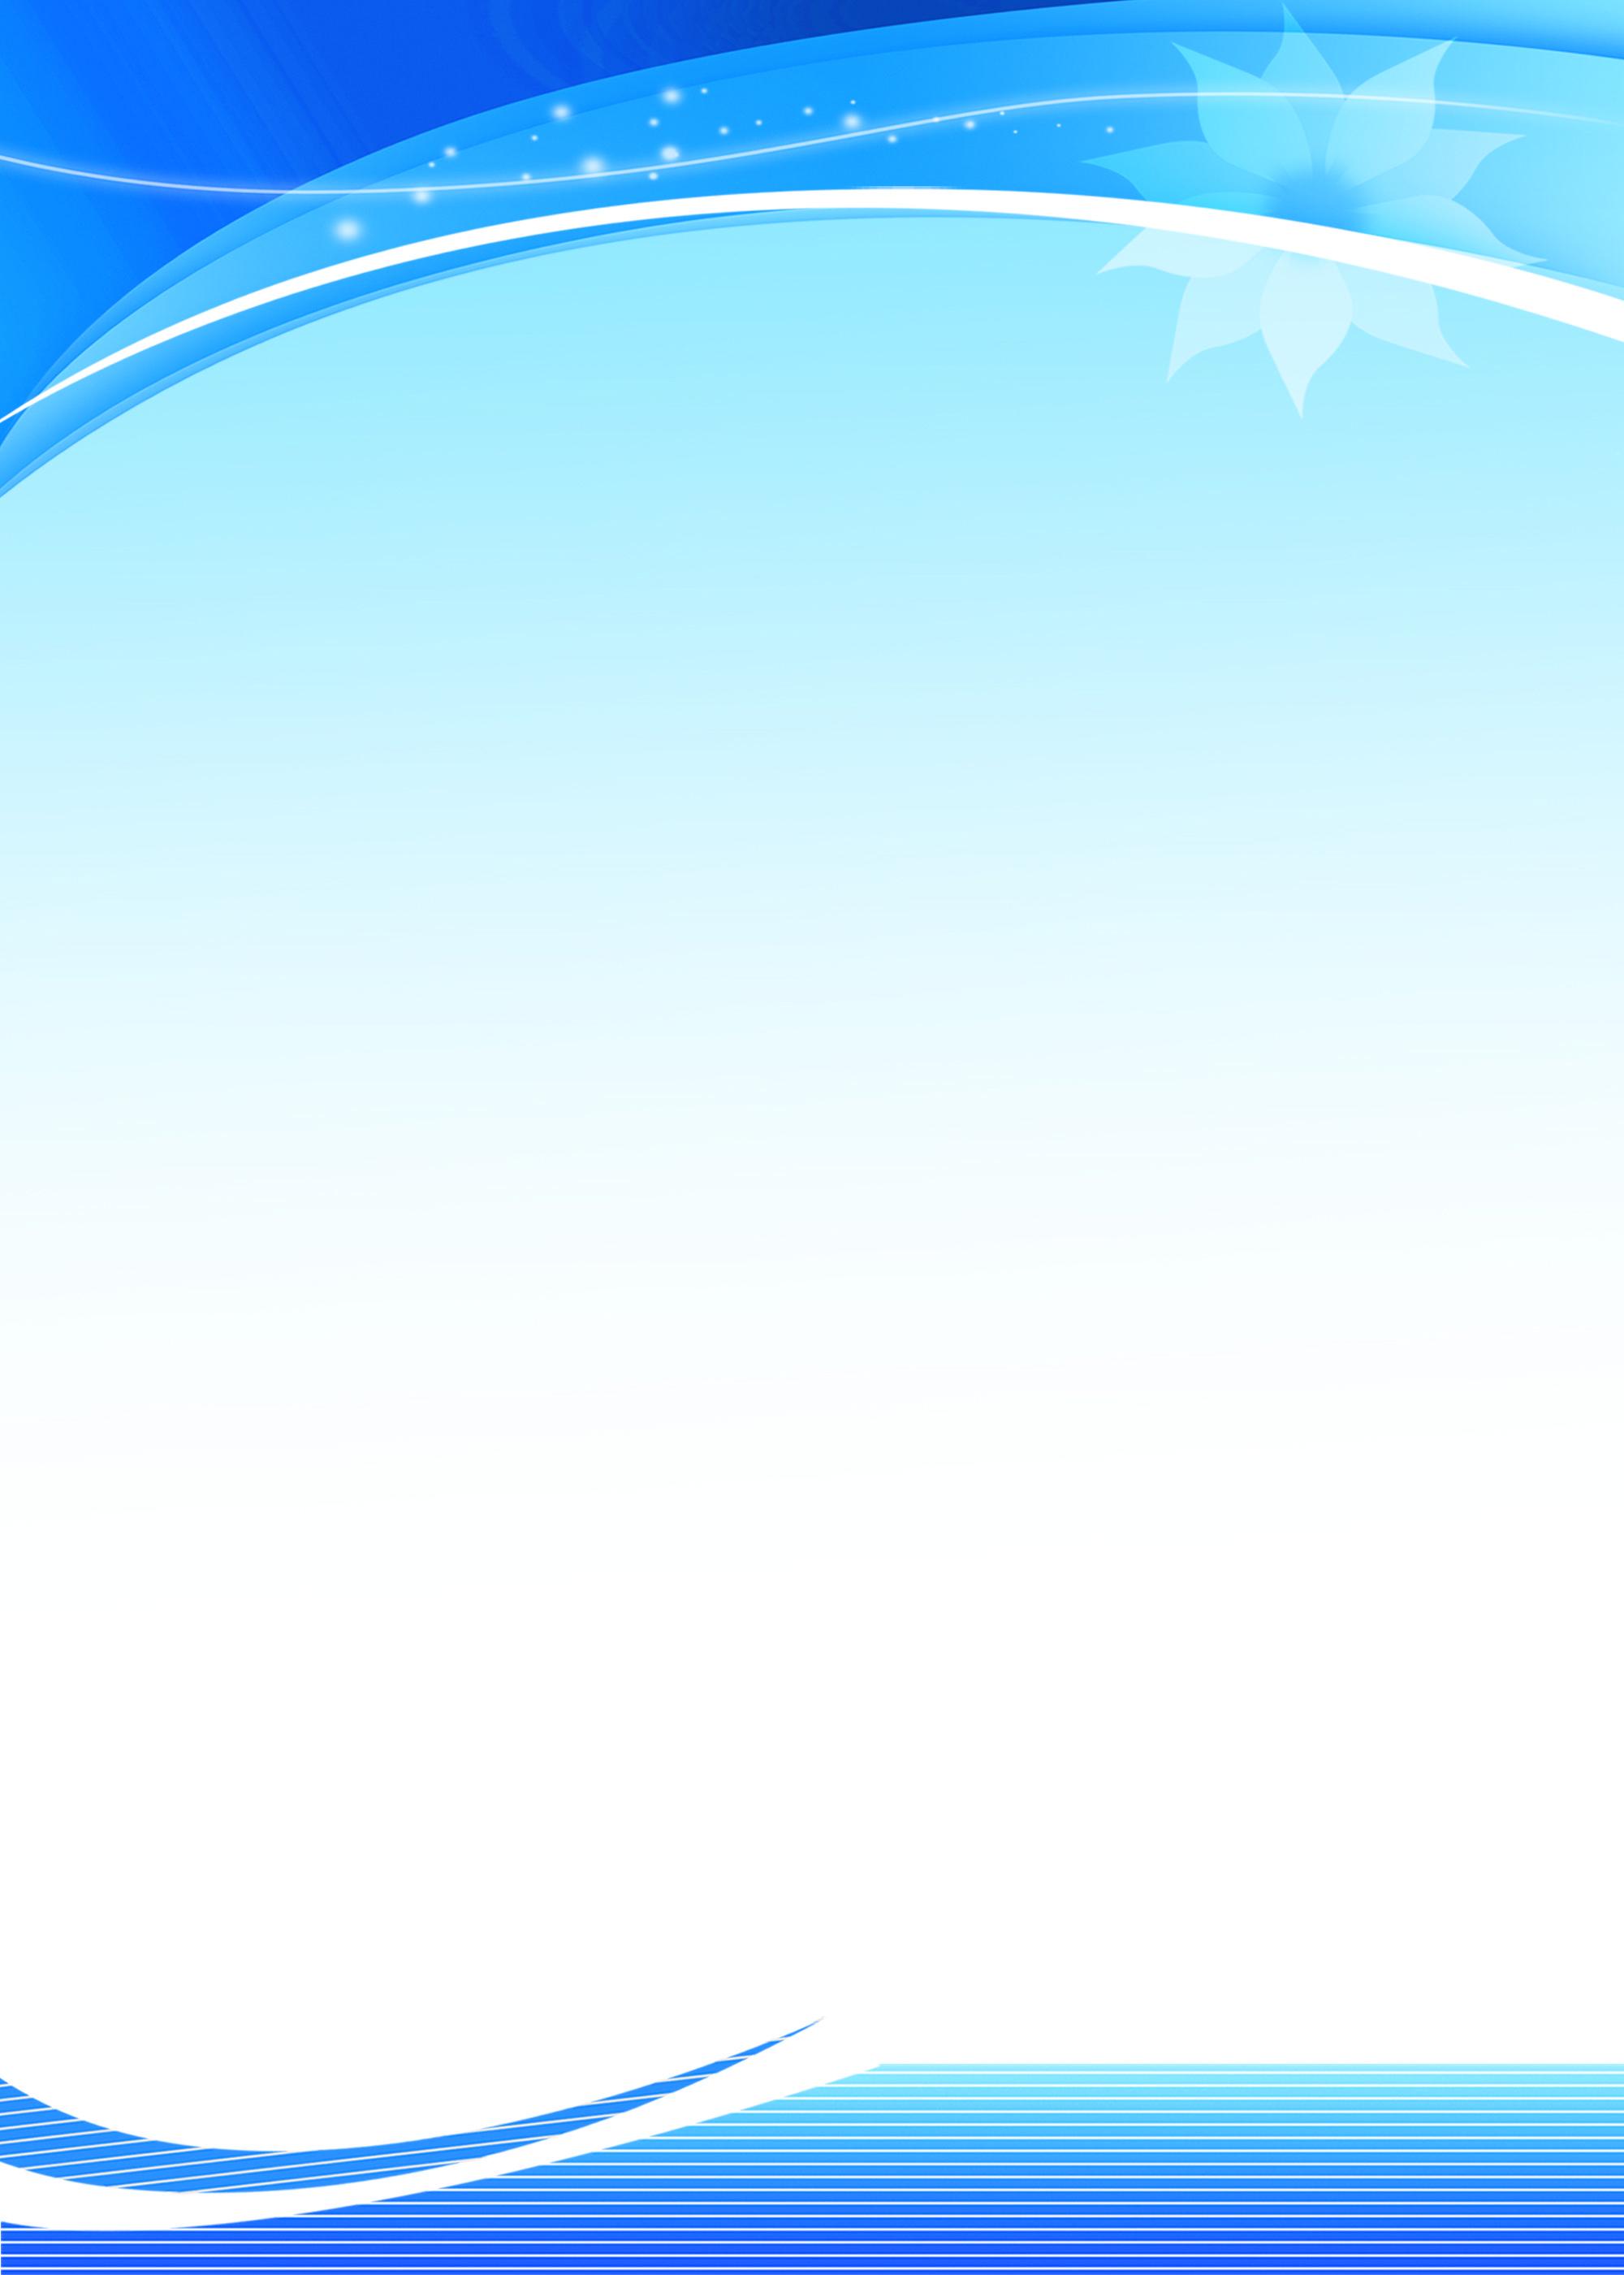 System Brand Image Template Background (มีรูปภาพ) พื้น